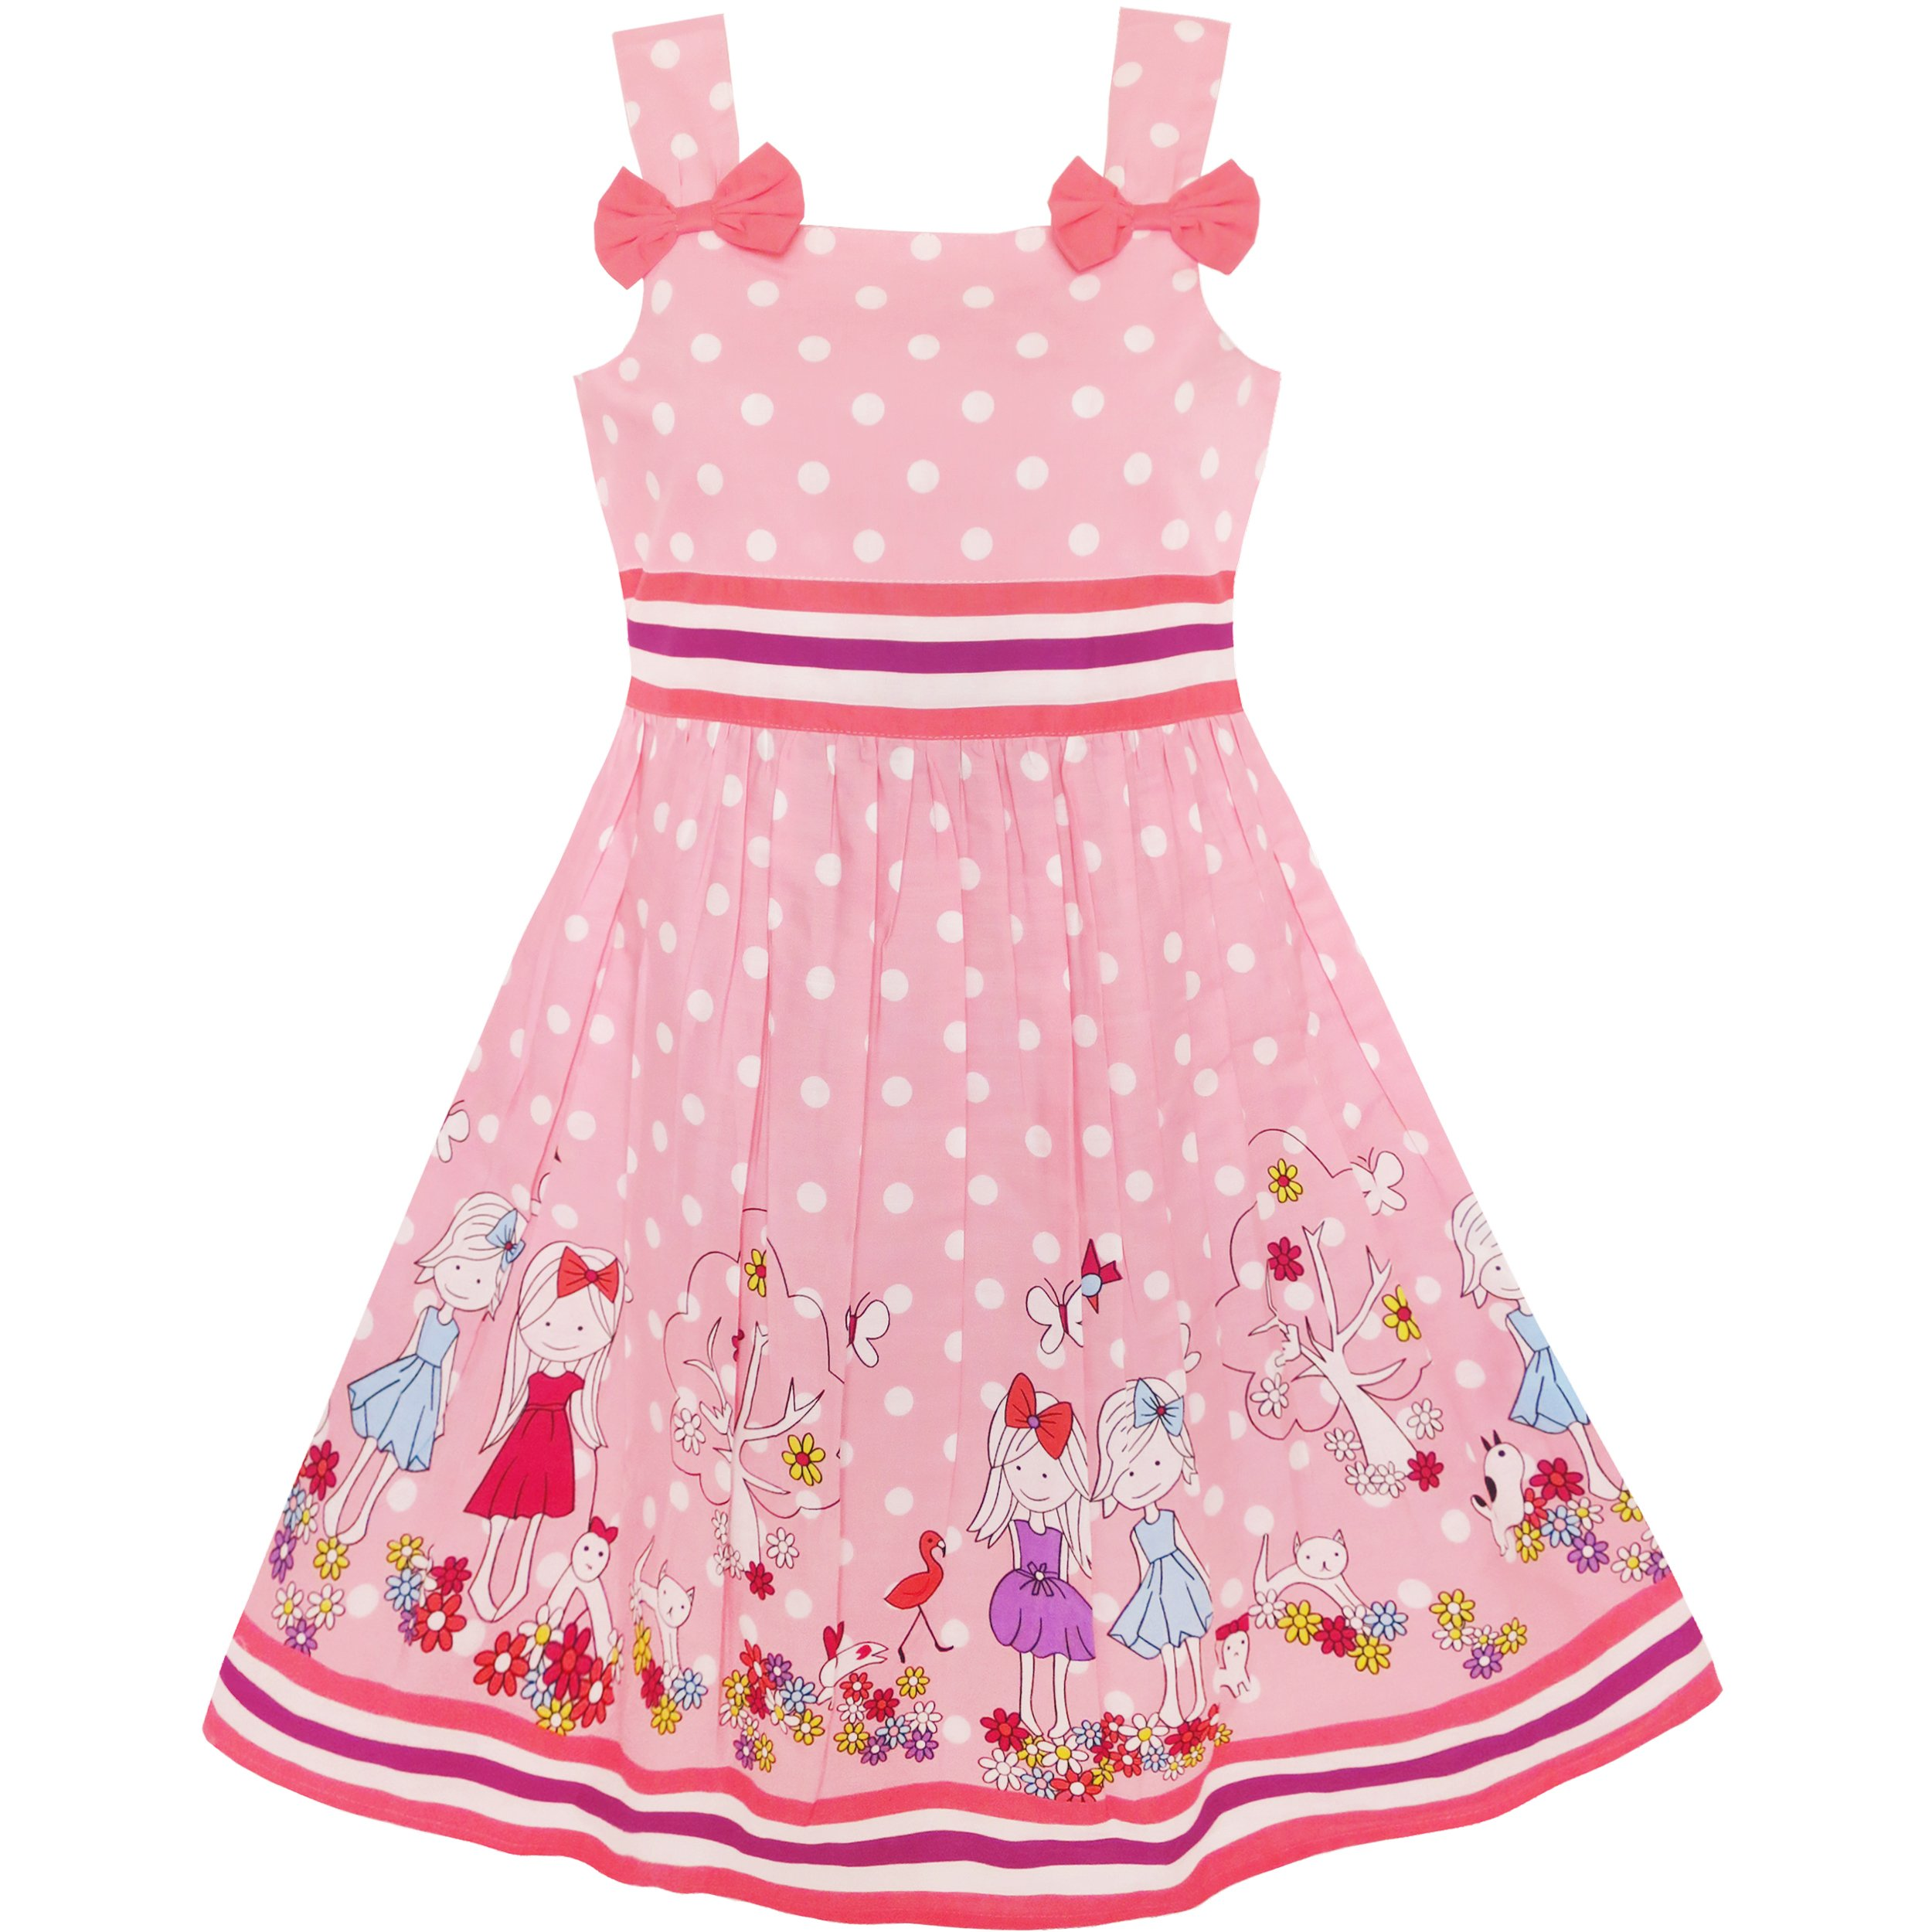 KM12 Girls Dress Cartoon Polka Dot Bow Tie Summer Size 4-5, pink